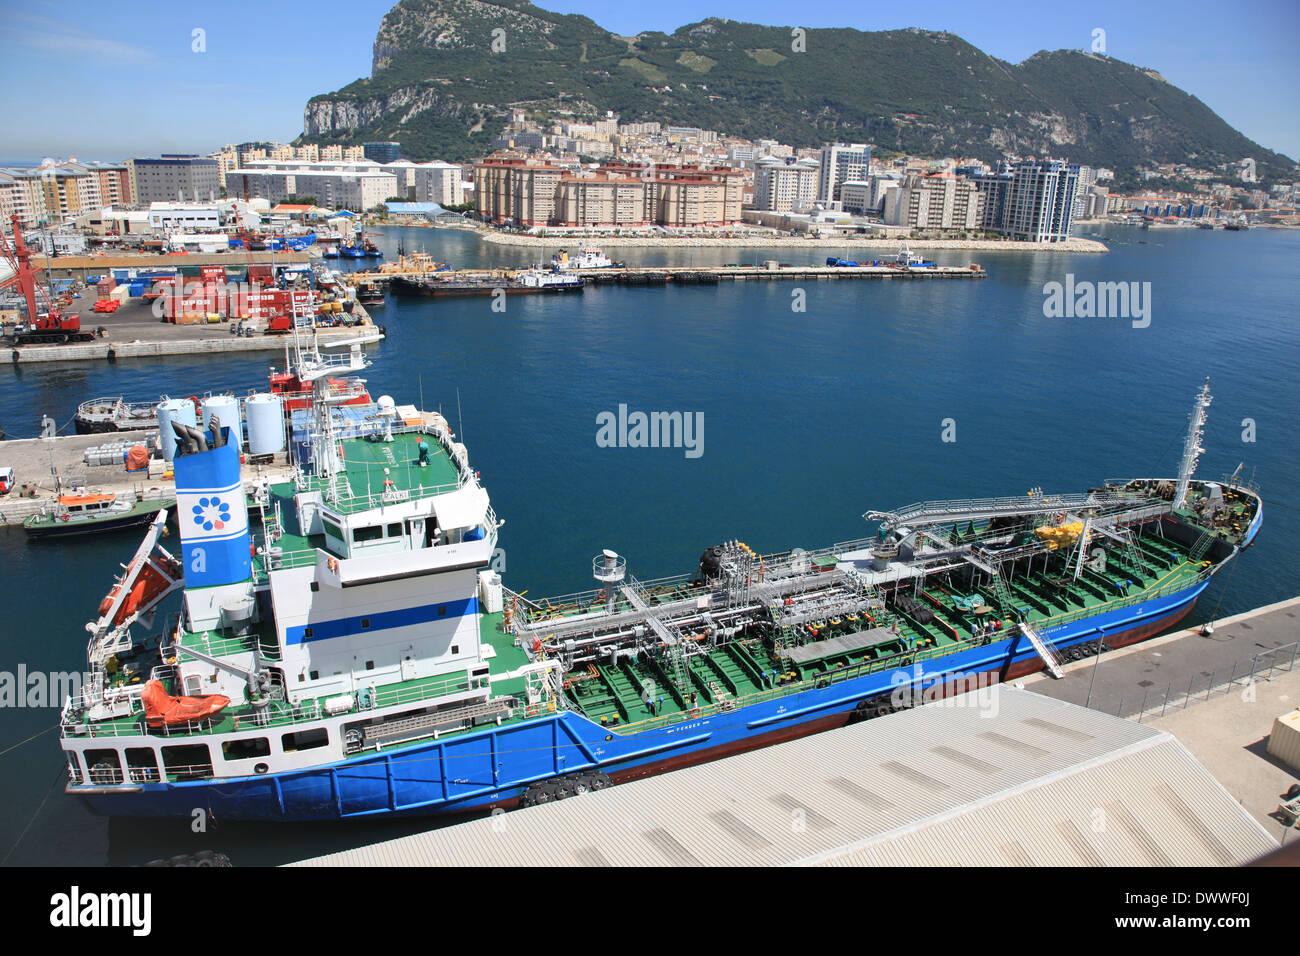 Oil products tanker mt HALKI moored in Gibraltar harbor - Stock Image